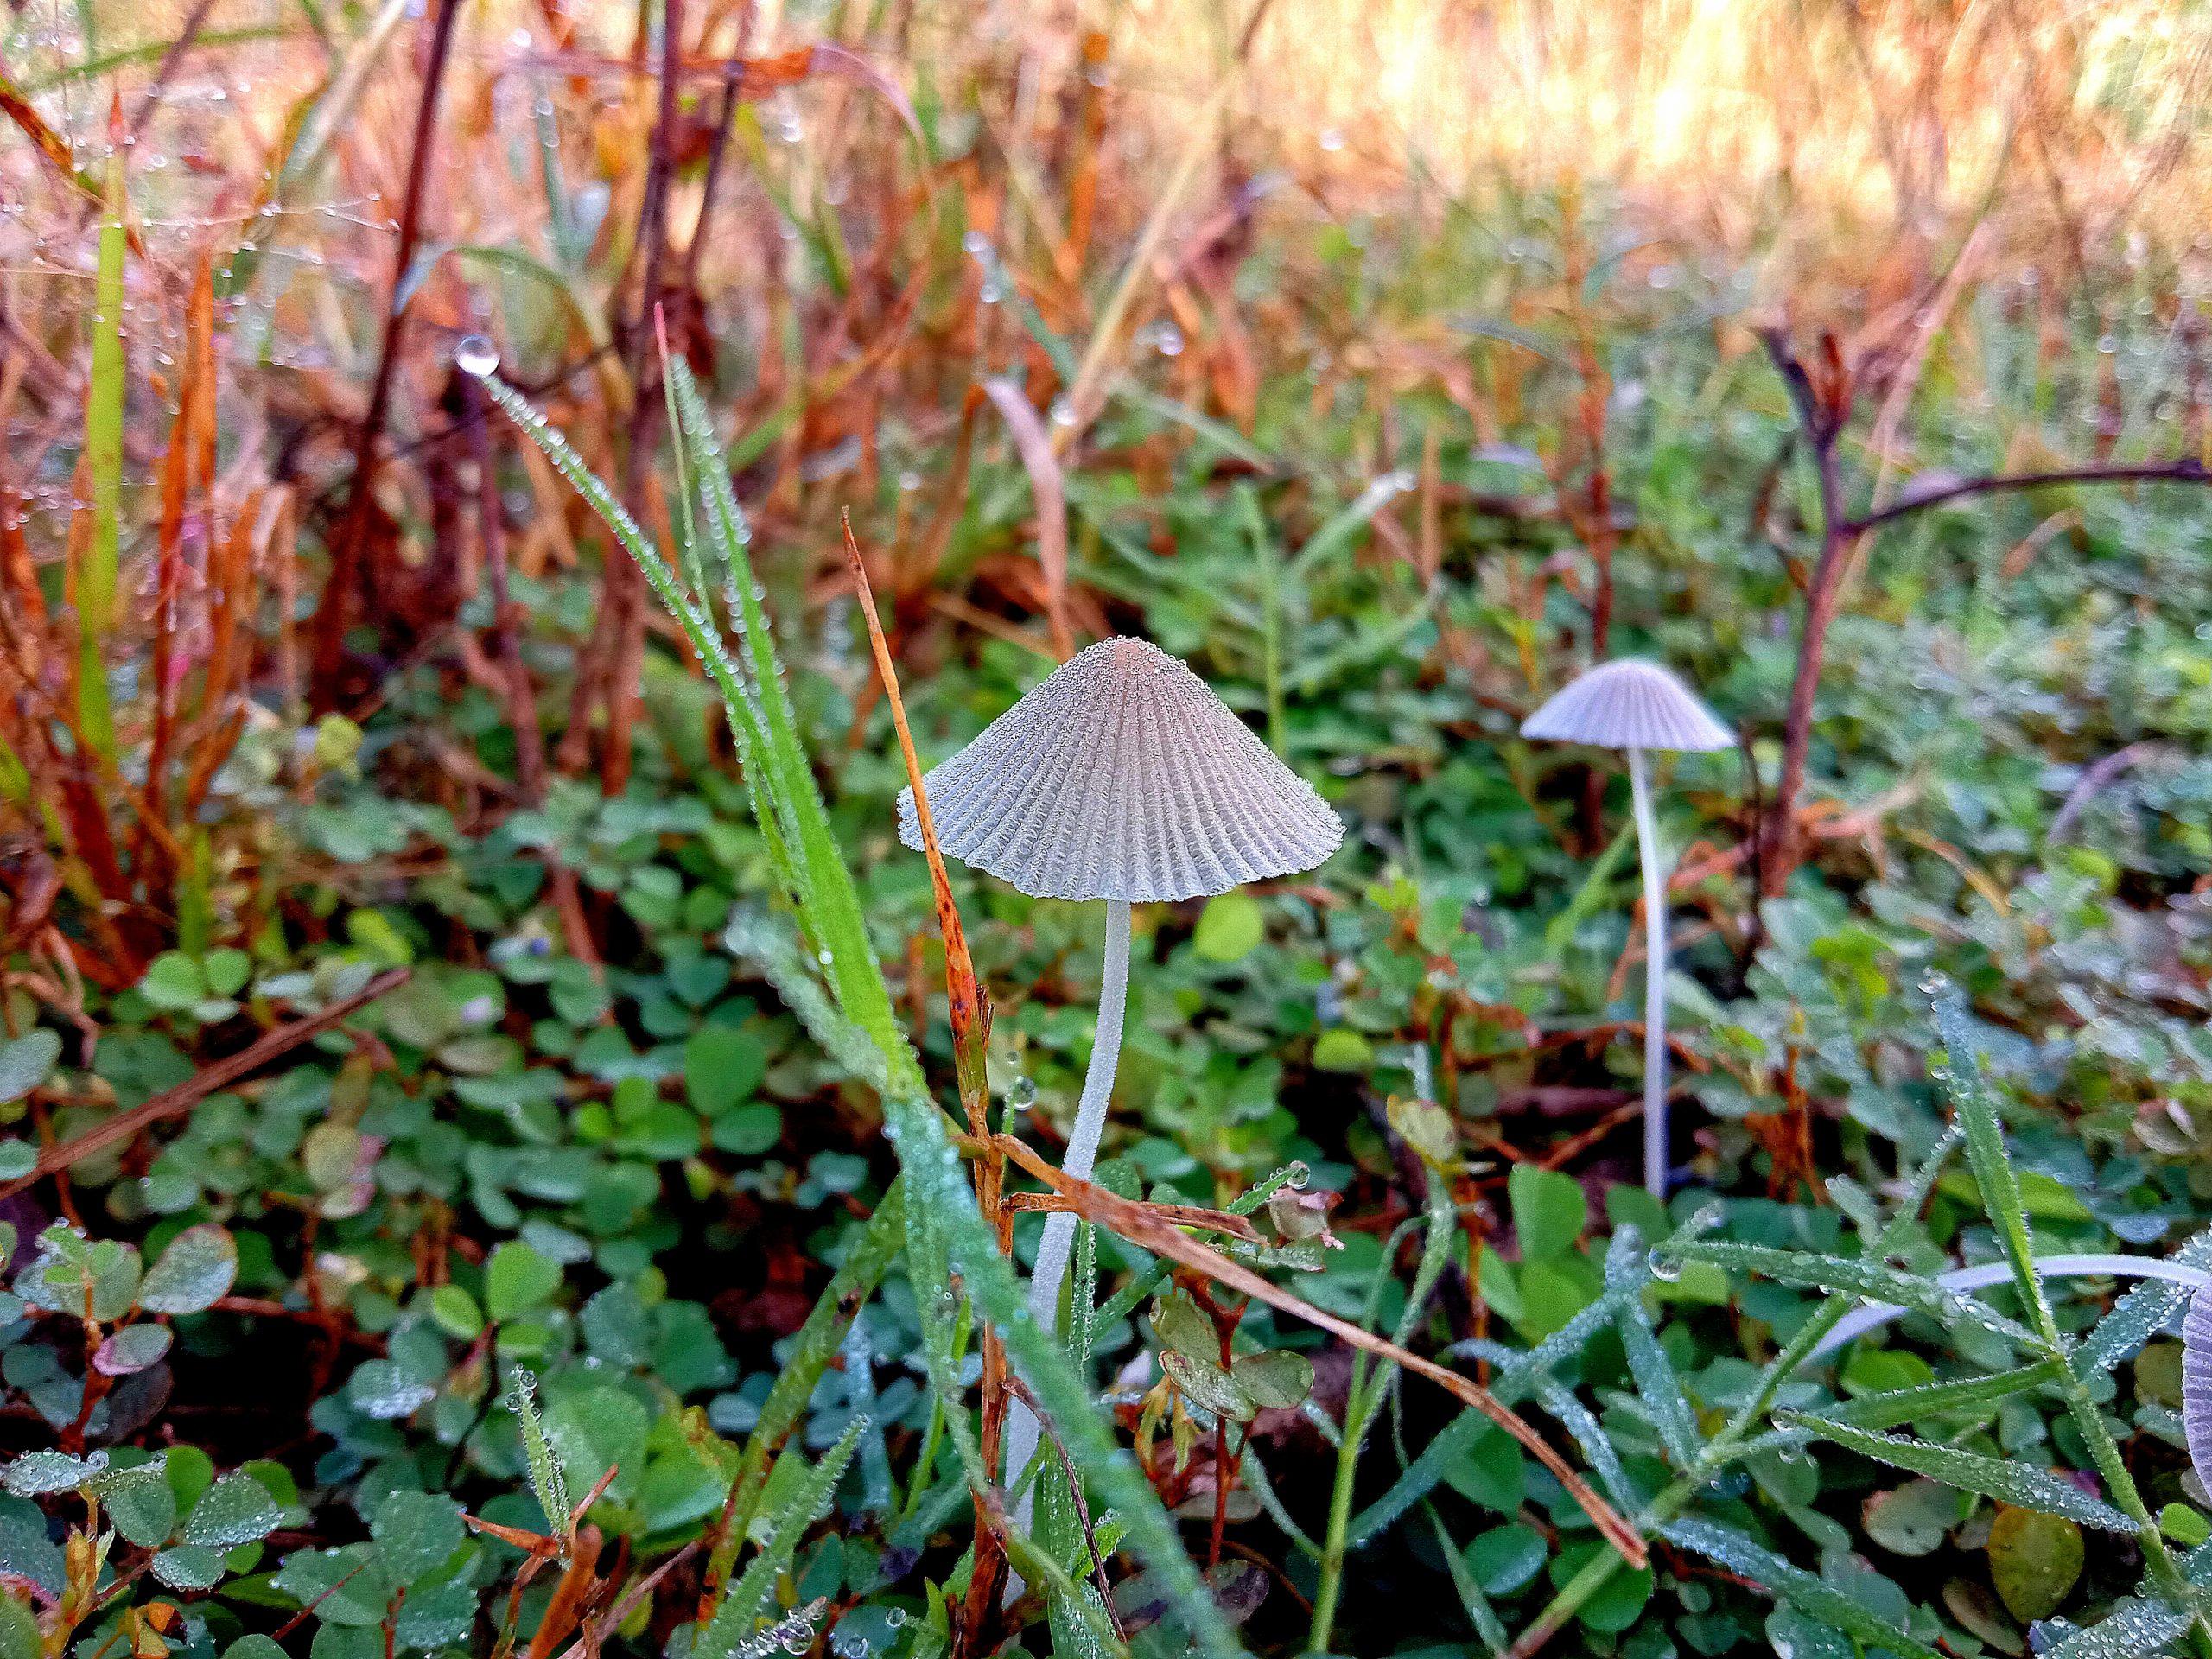 Mushroom plant in farm